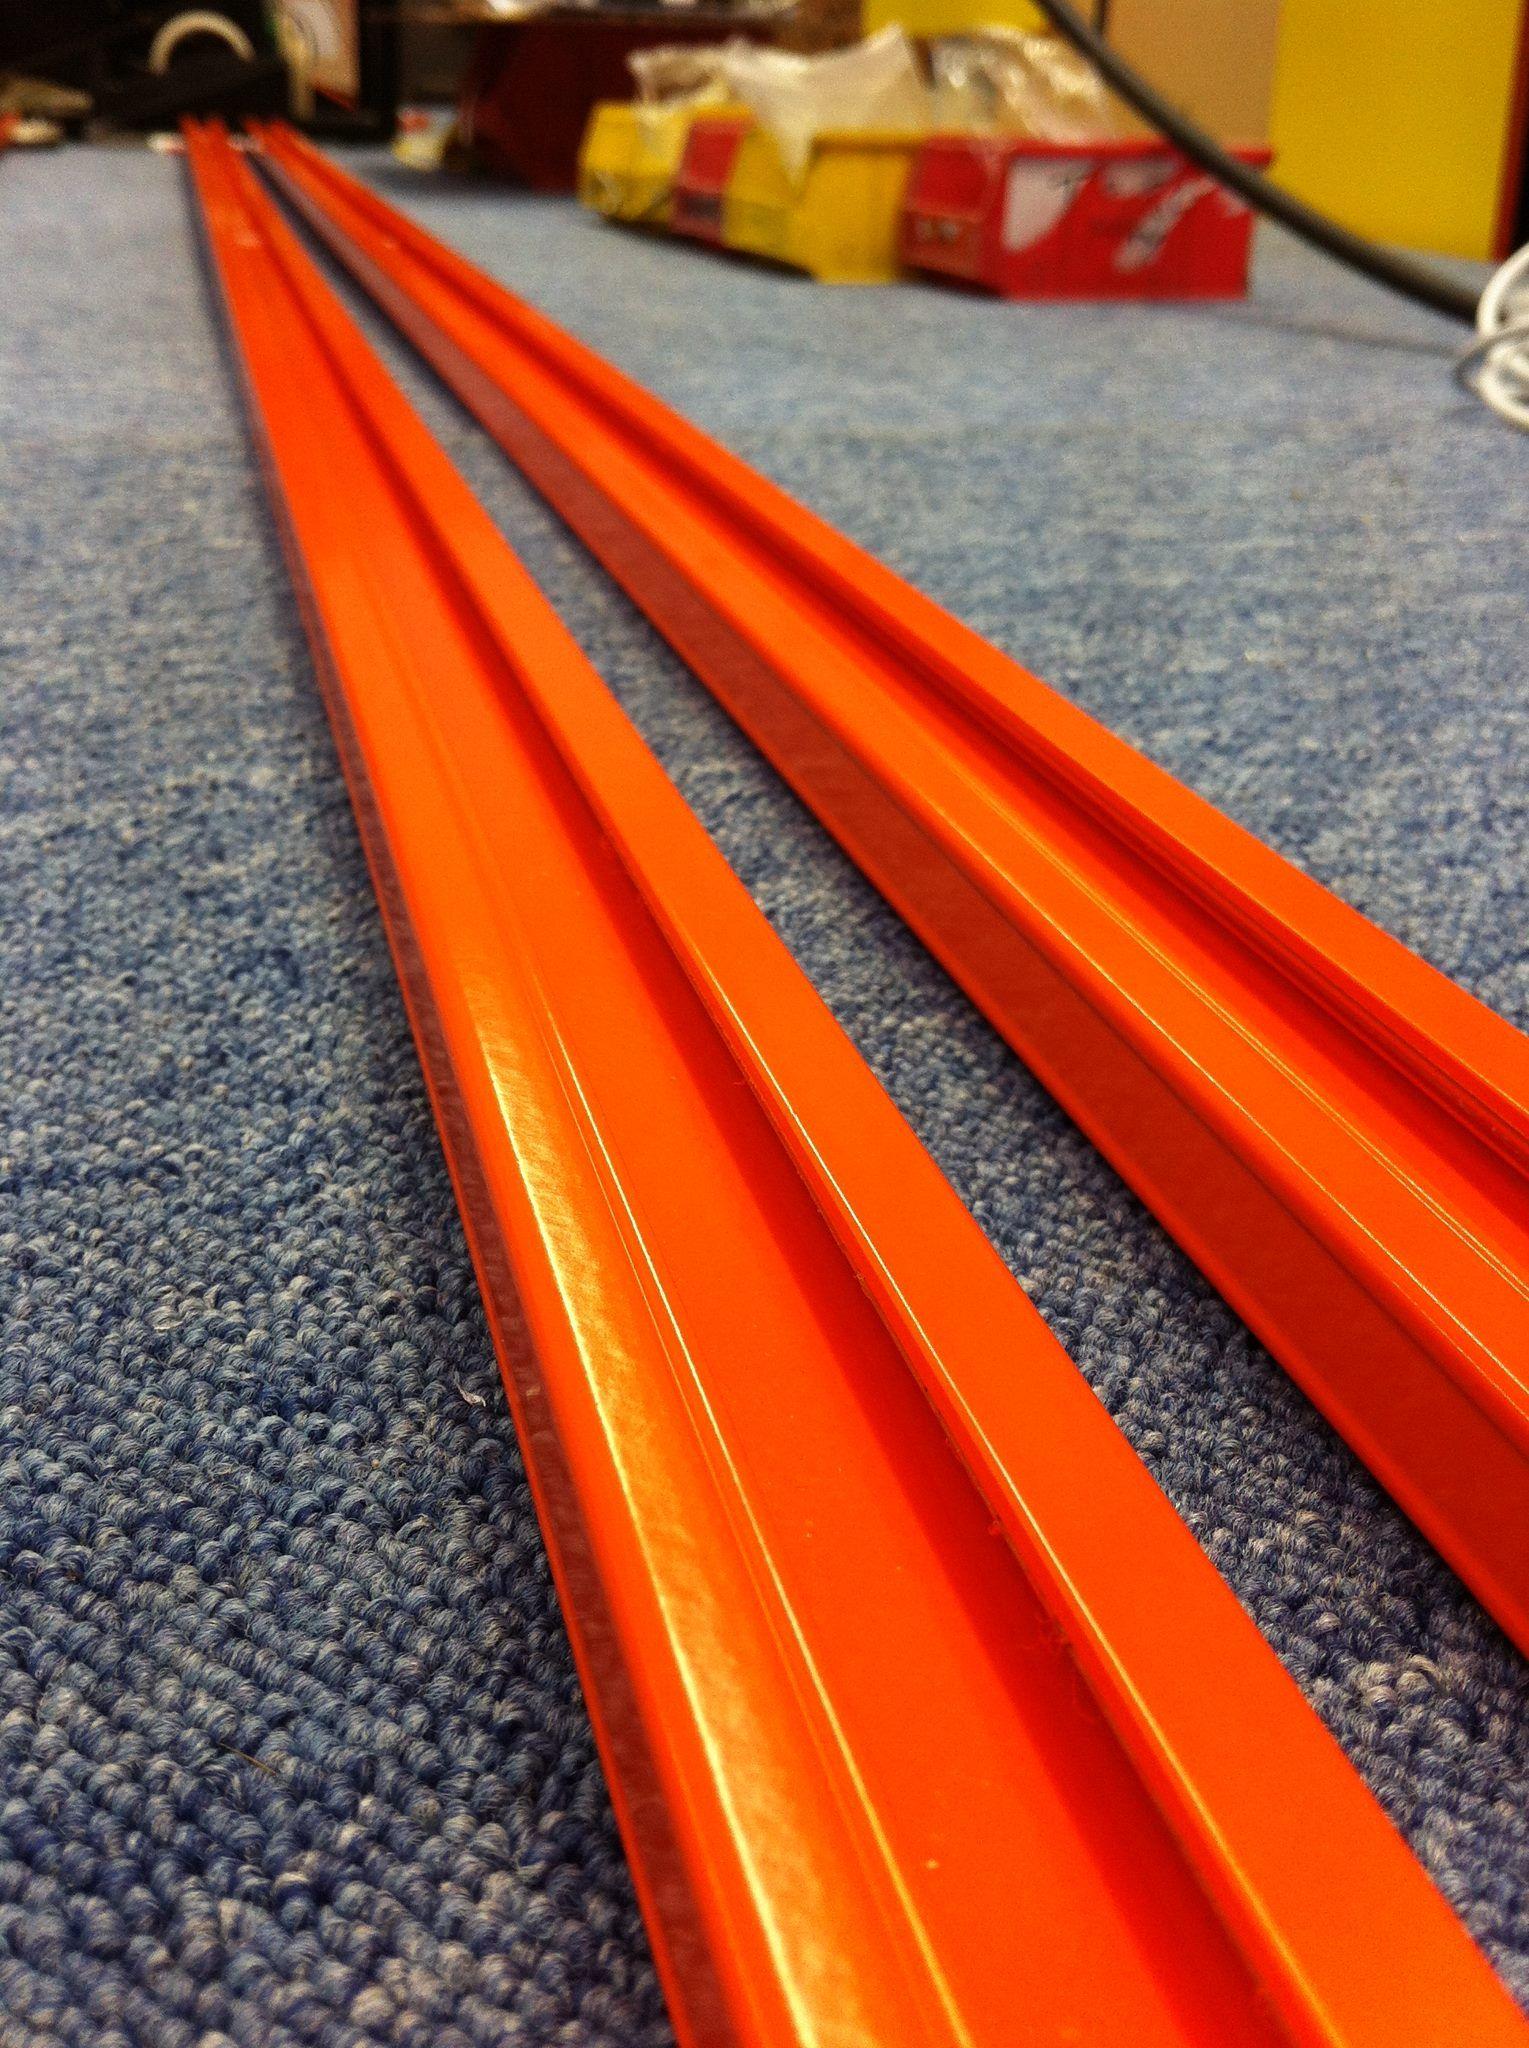 Illuma Lighting Posted This Photo Of Orange Track